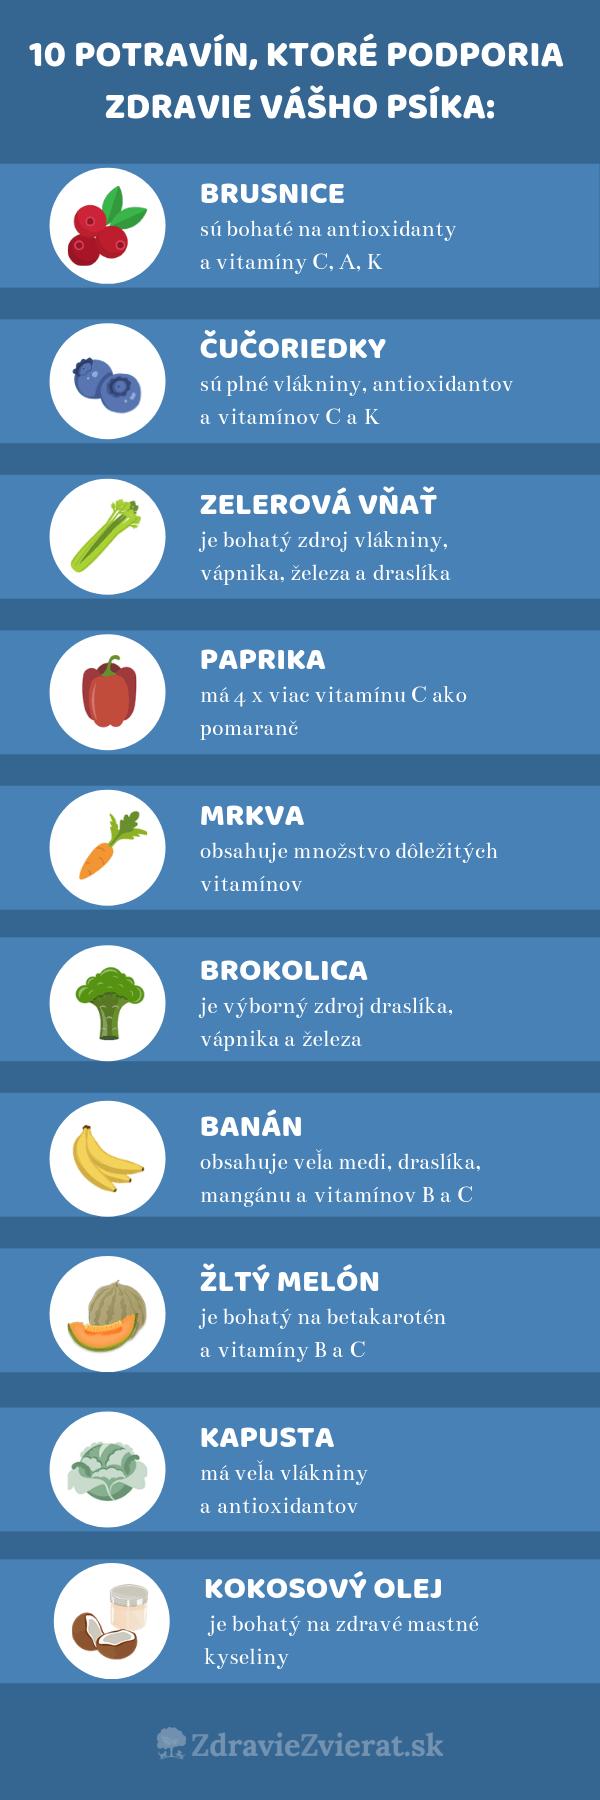 10-potravin-ktore-podporia-zdravie-vasho-psika